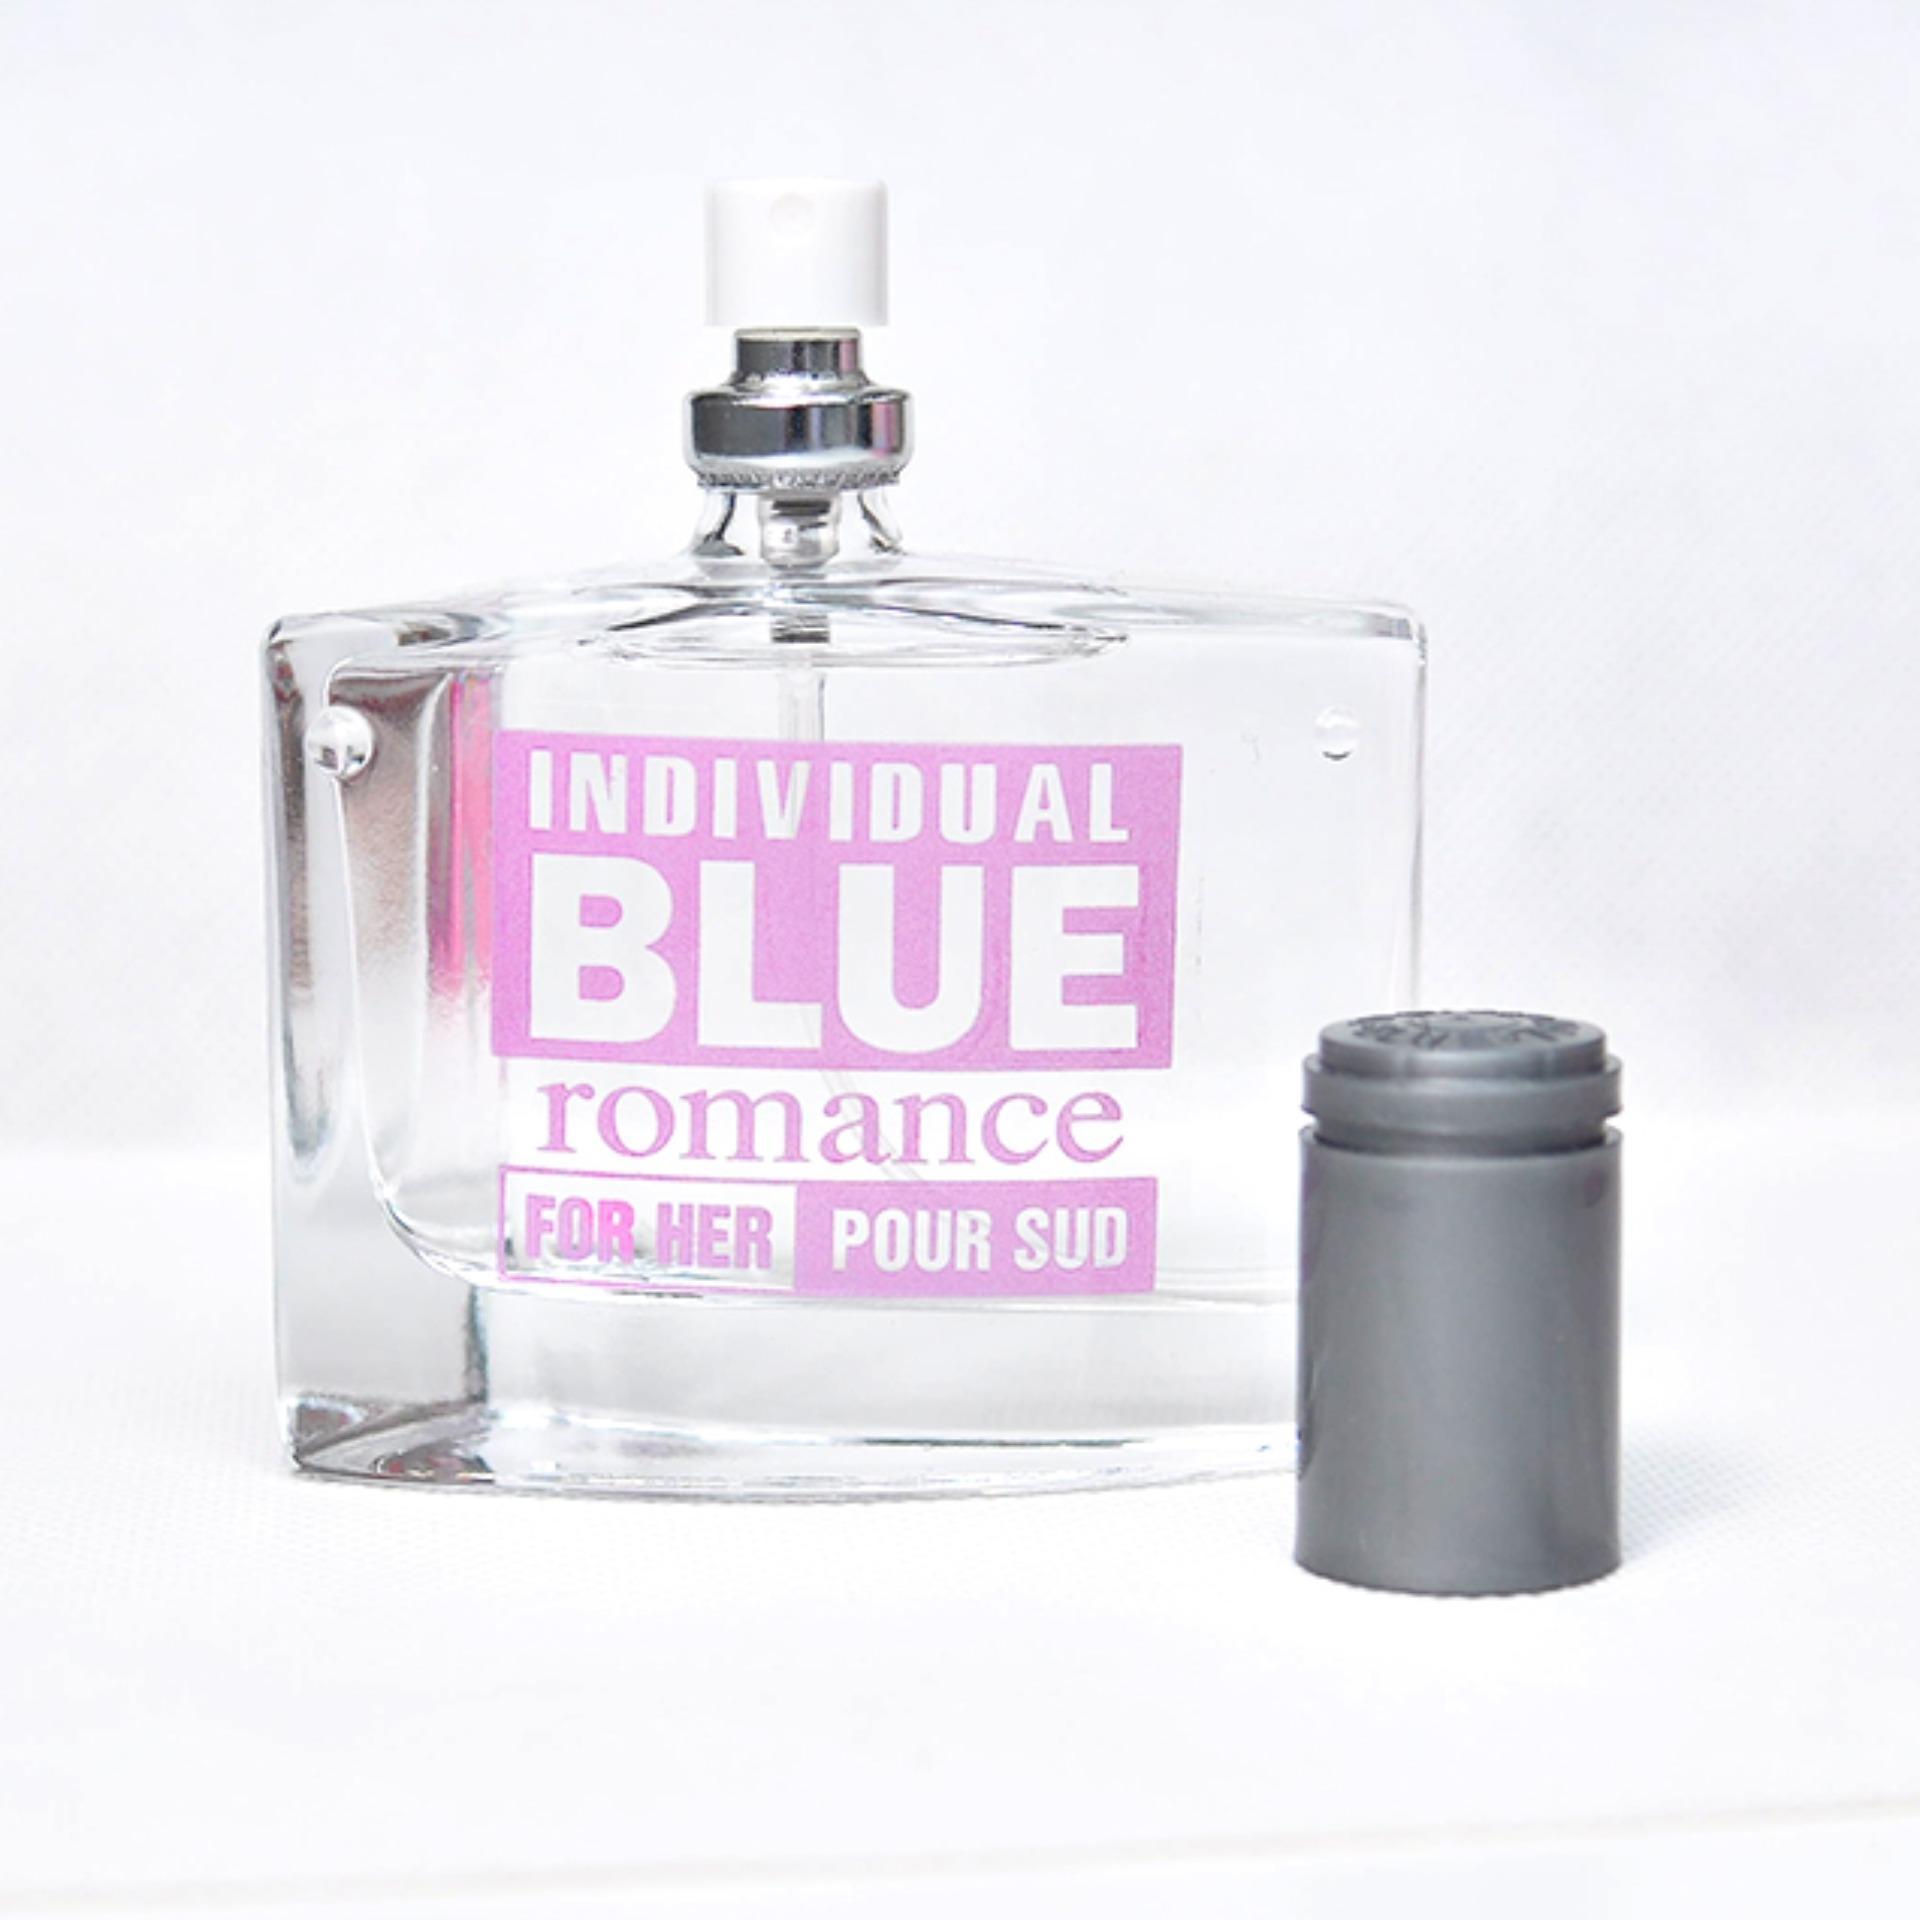 Nước Hoa Nữ Blue Romance Individual pour elle 50ml ( Hồng)